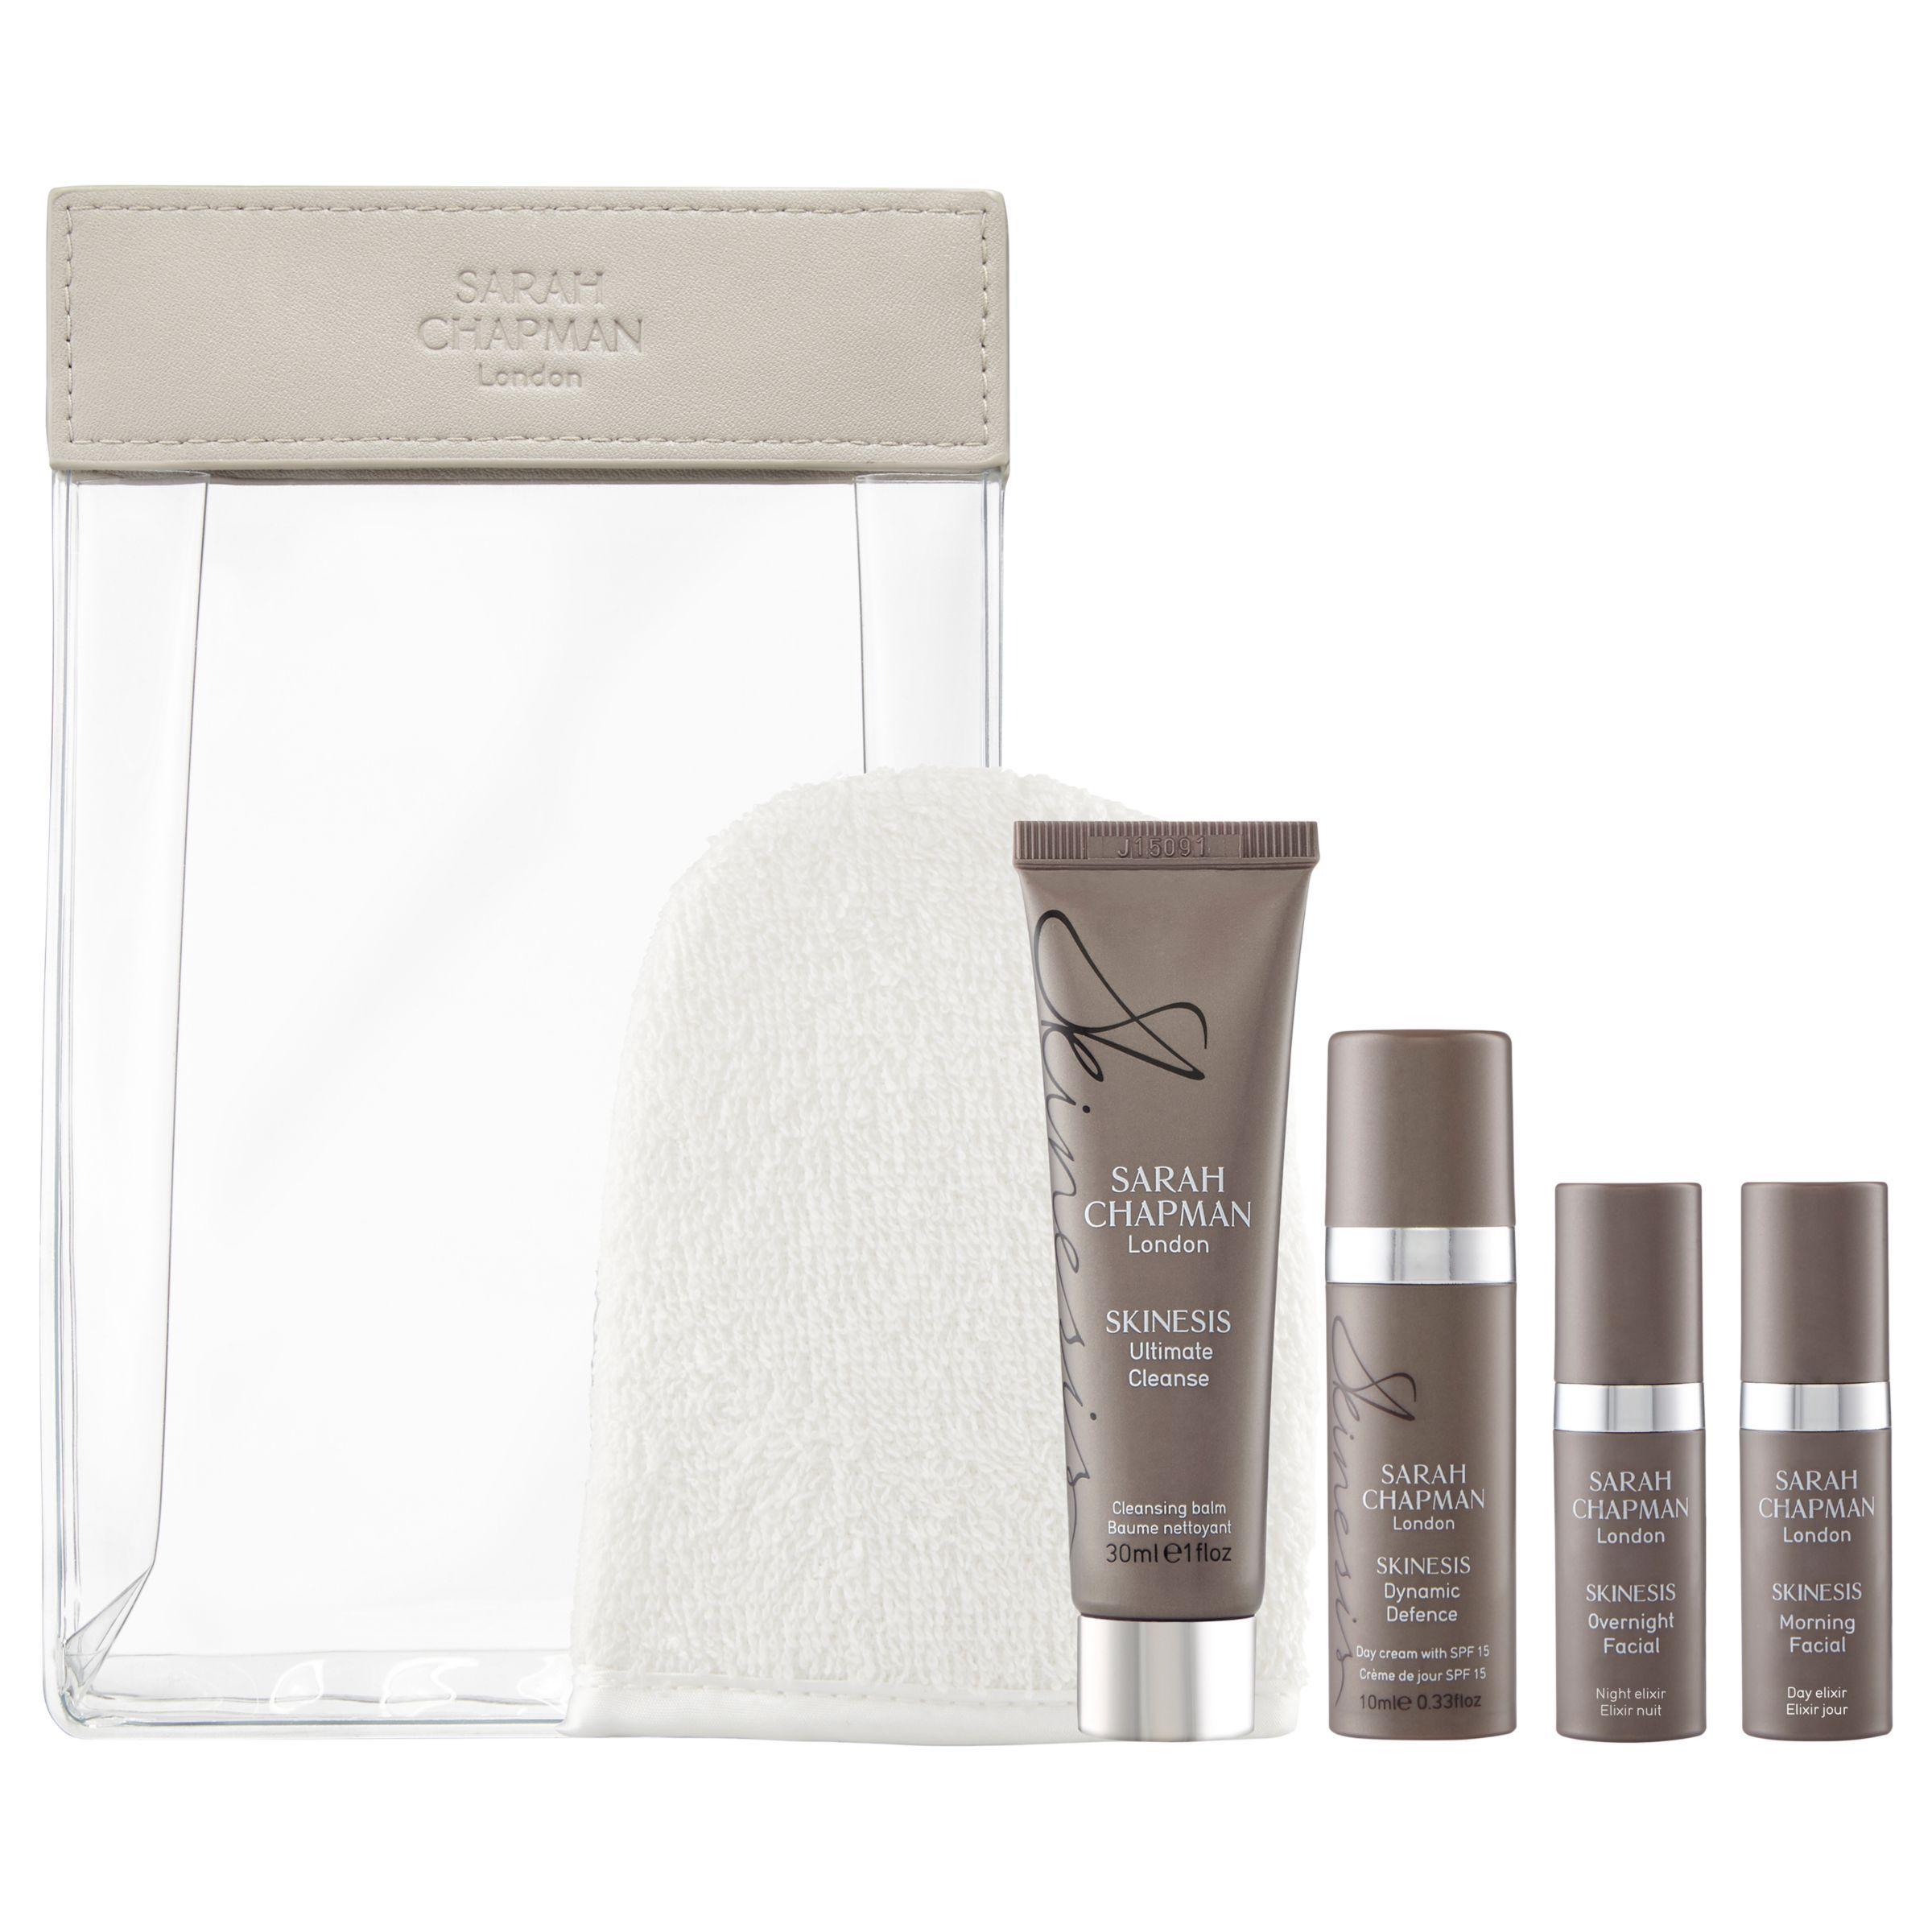 Sarah Chapman The Elixir Collection Skincare Gift Set